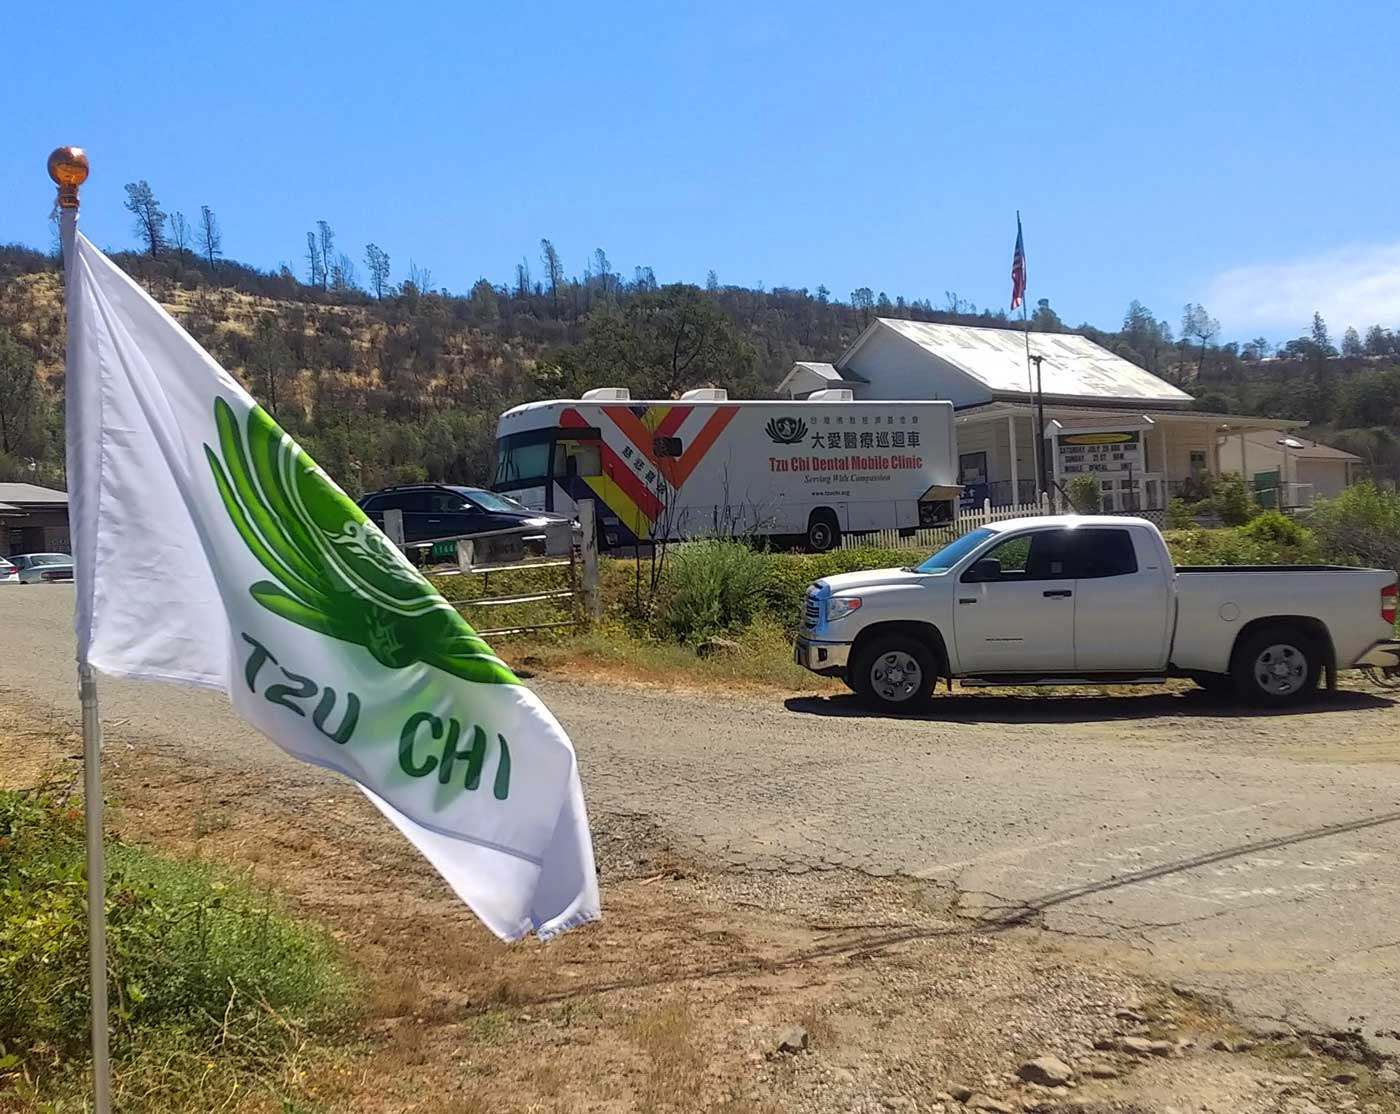 TzuChiUSA_camp-fire-medical-outreach-IMG_20190721_111235